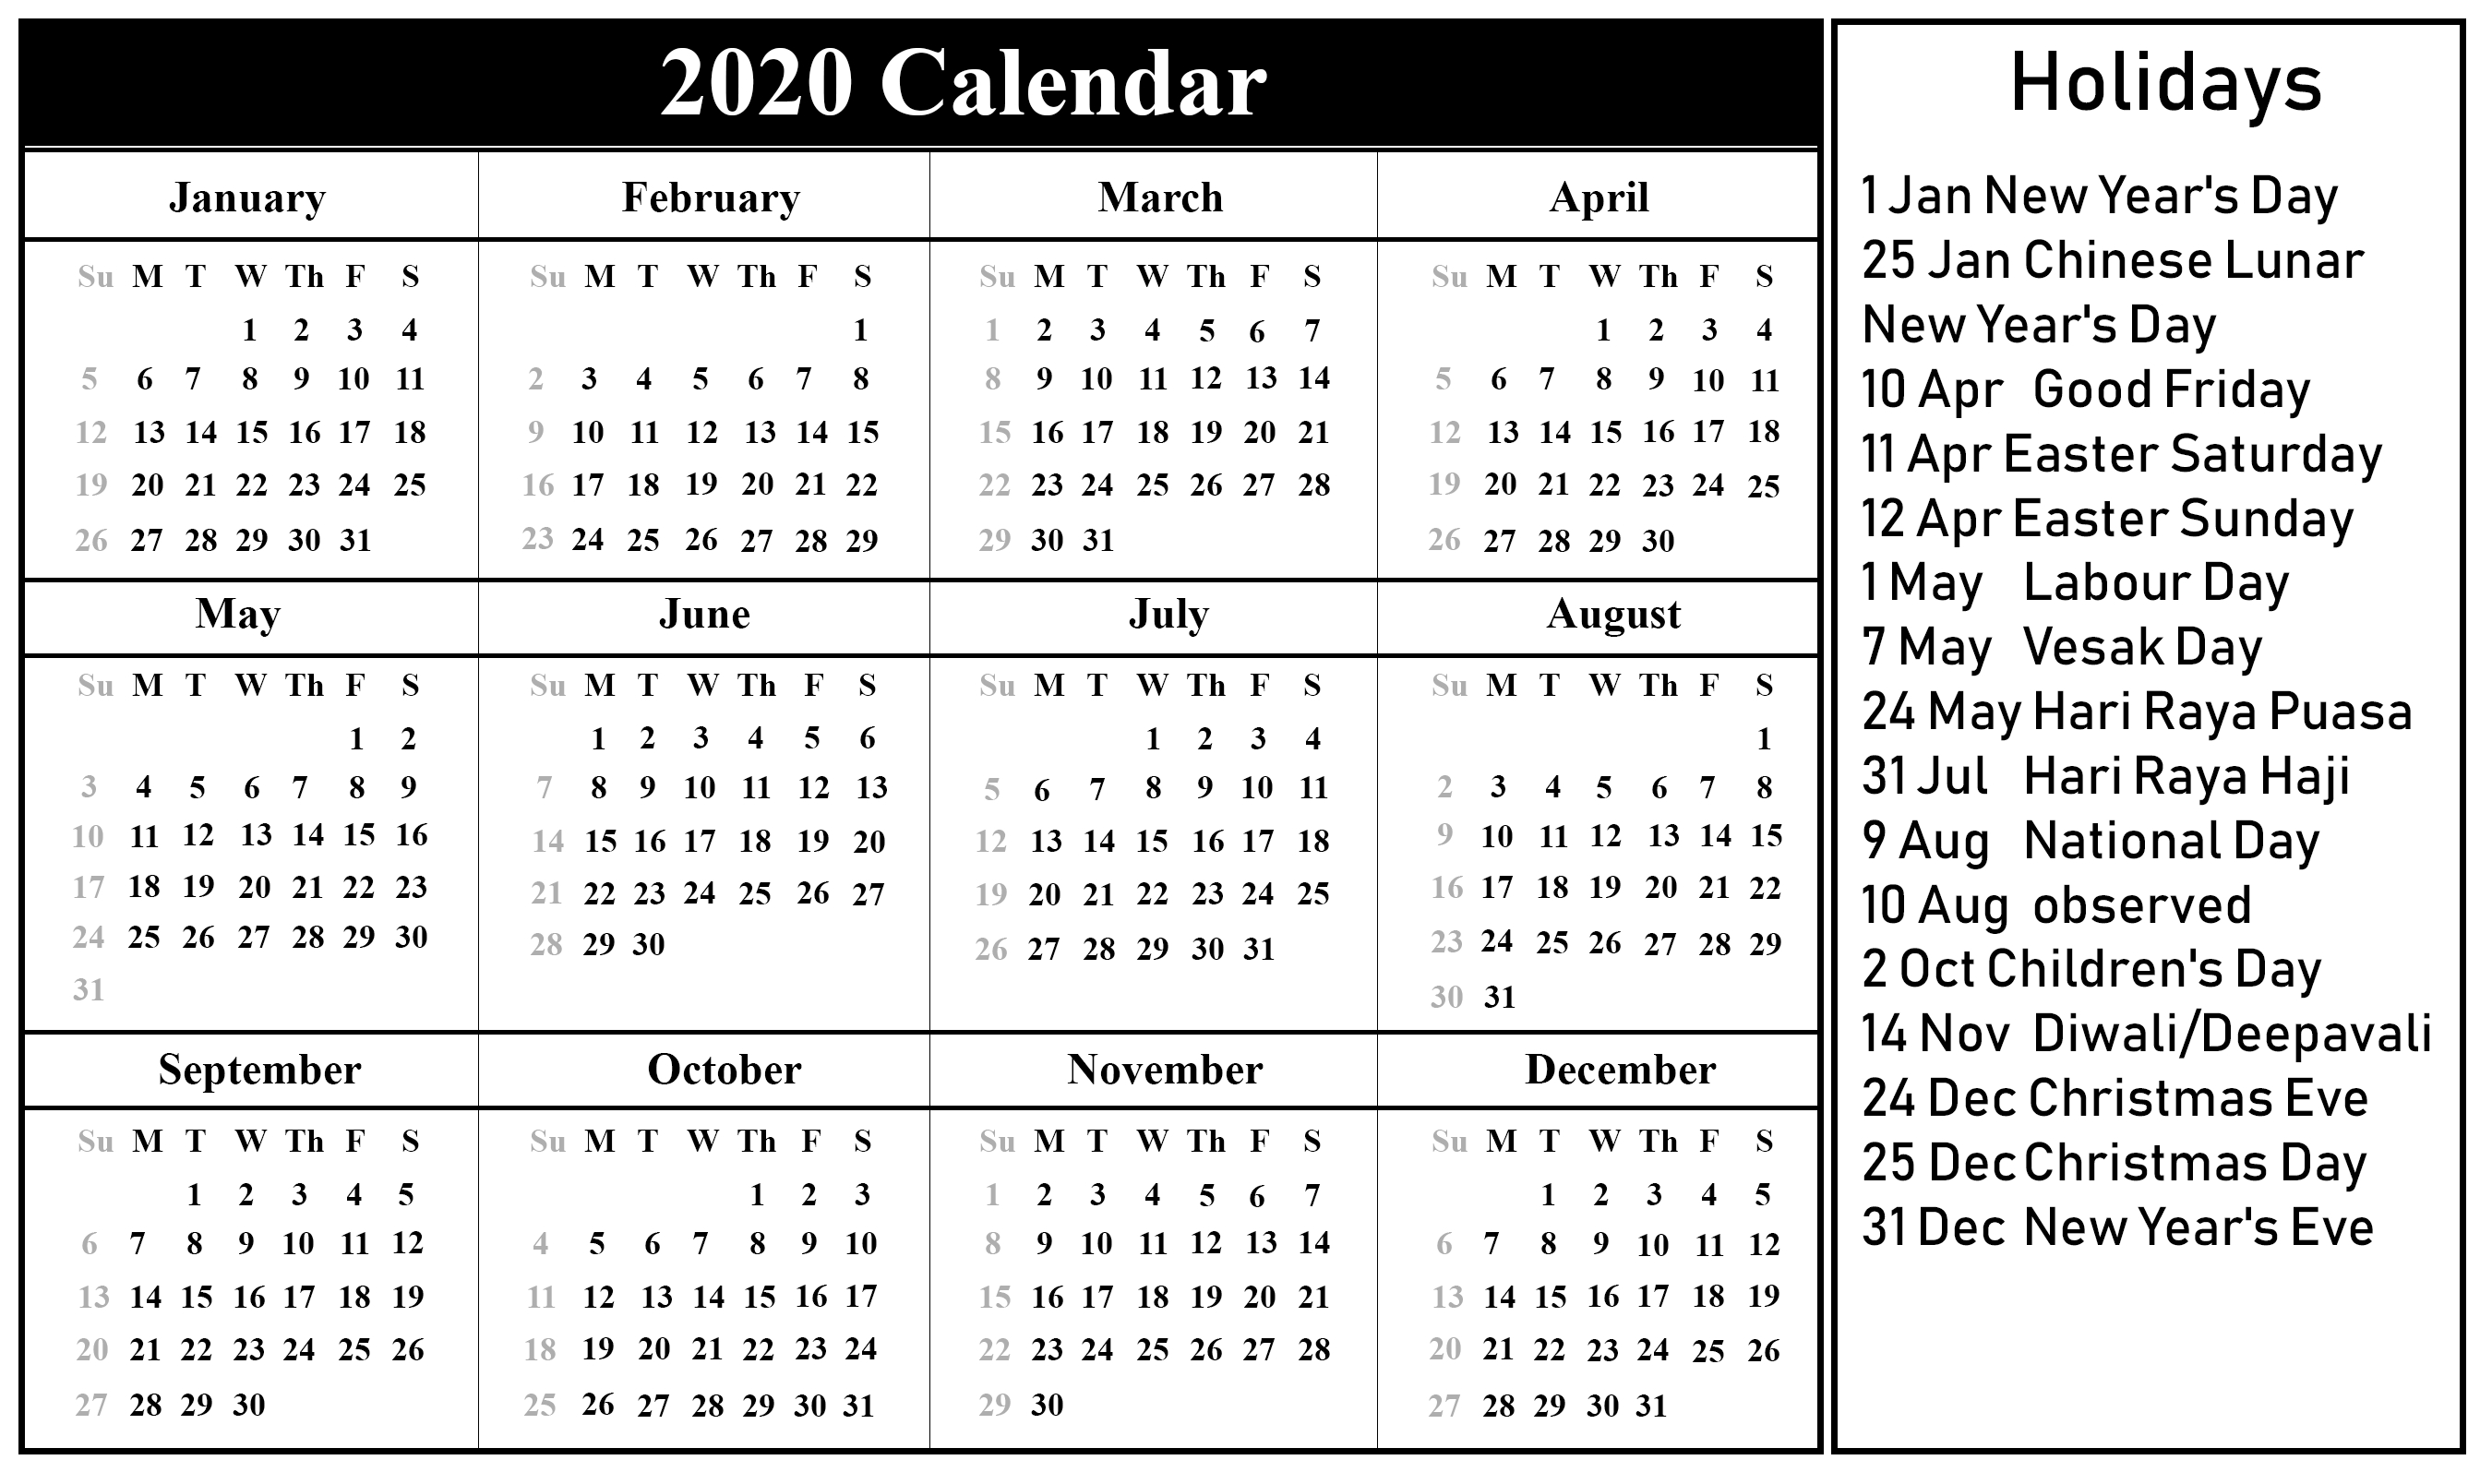 Printable 2020 Calendar With Holidays | Monthly Calendar-National Calendar Holidays 2020